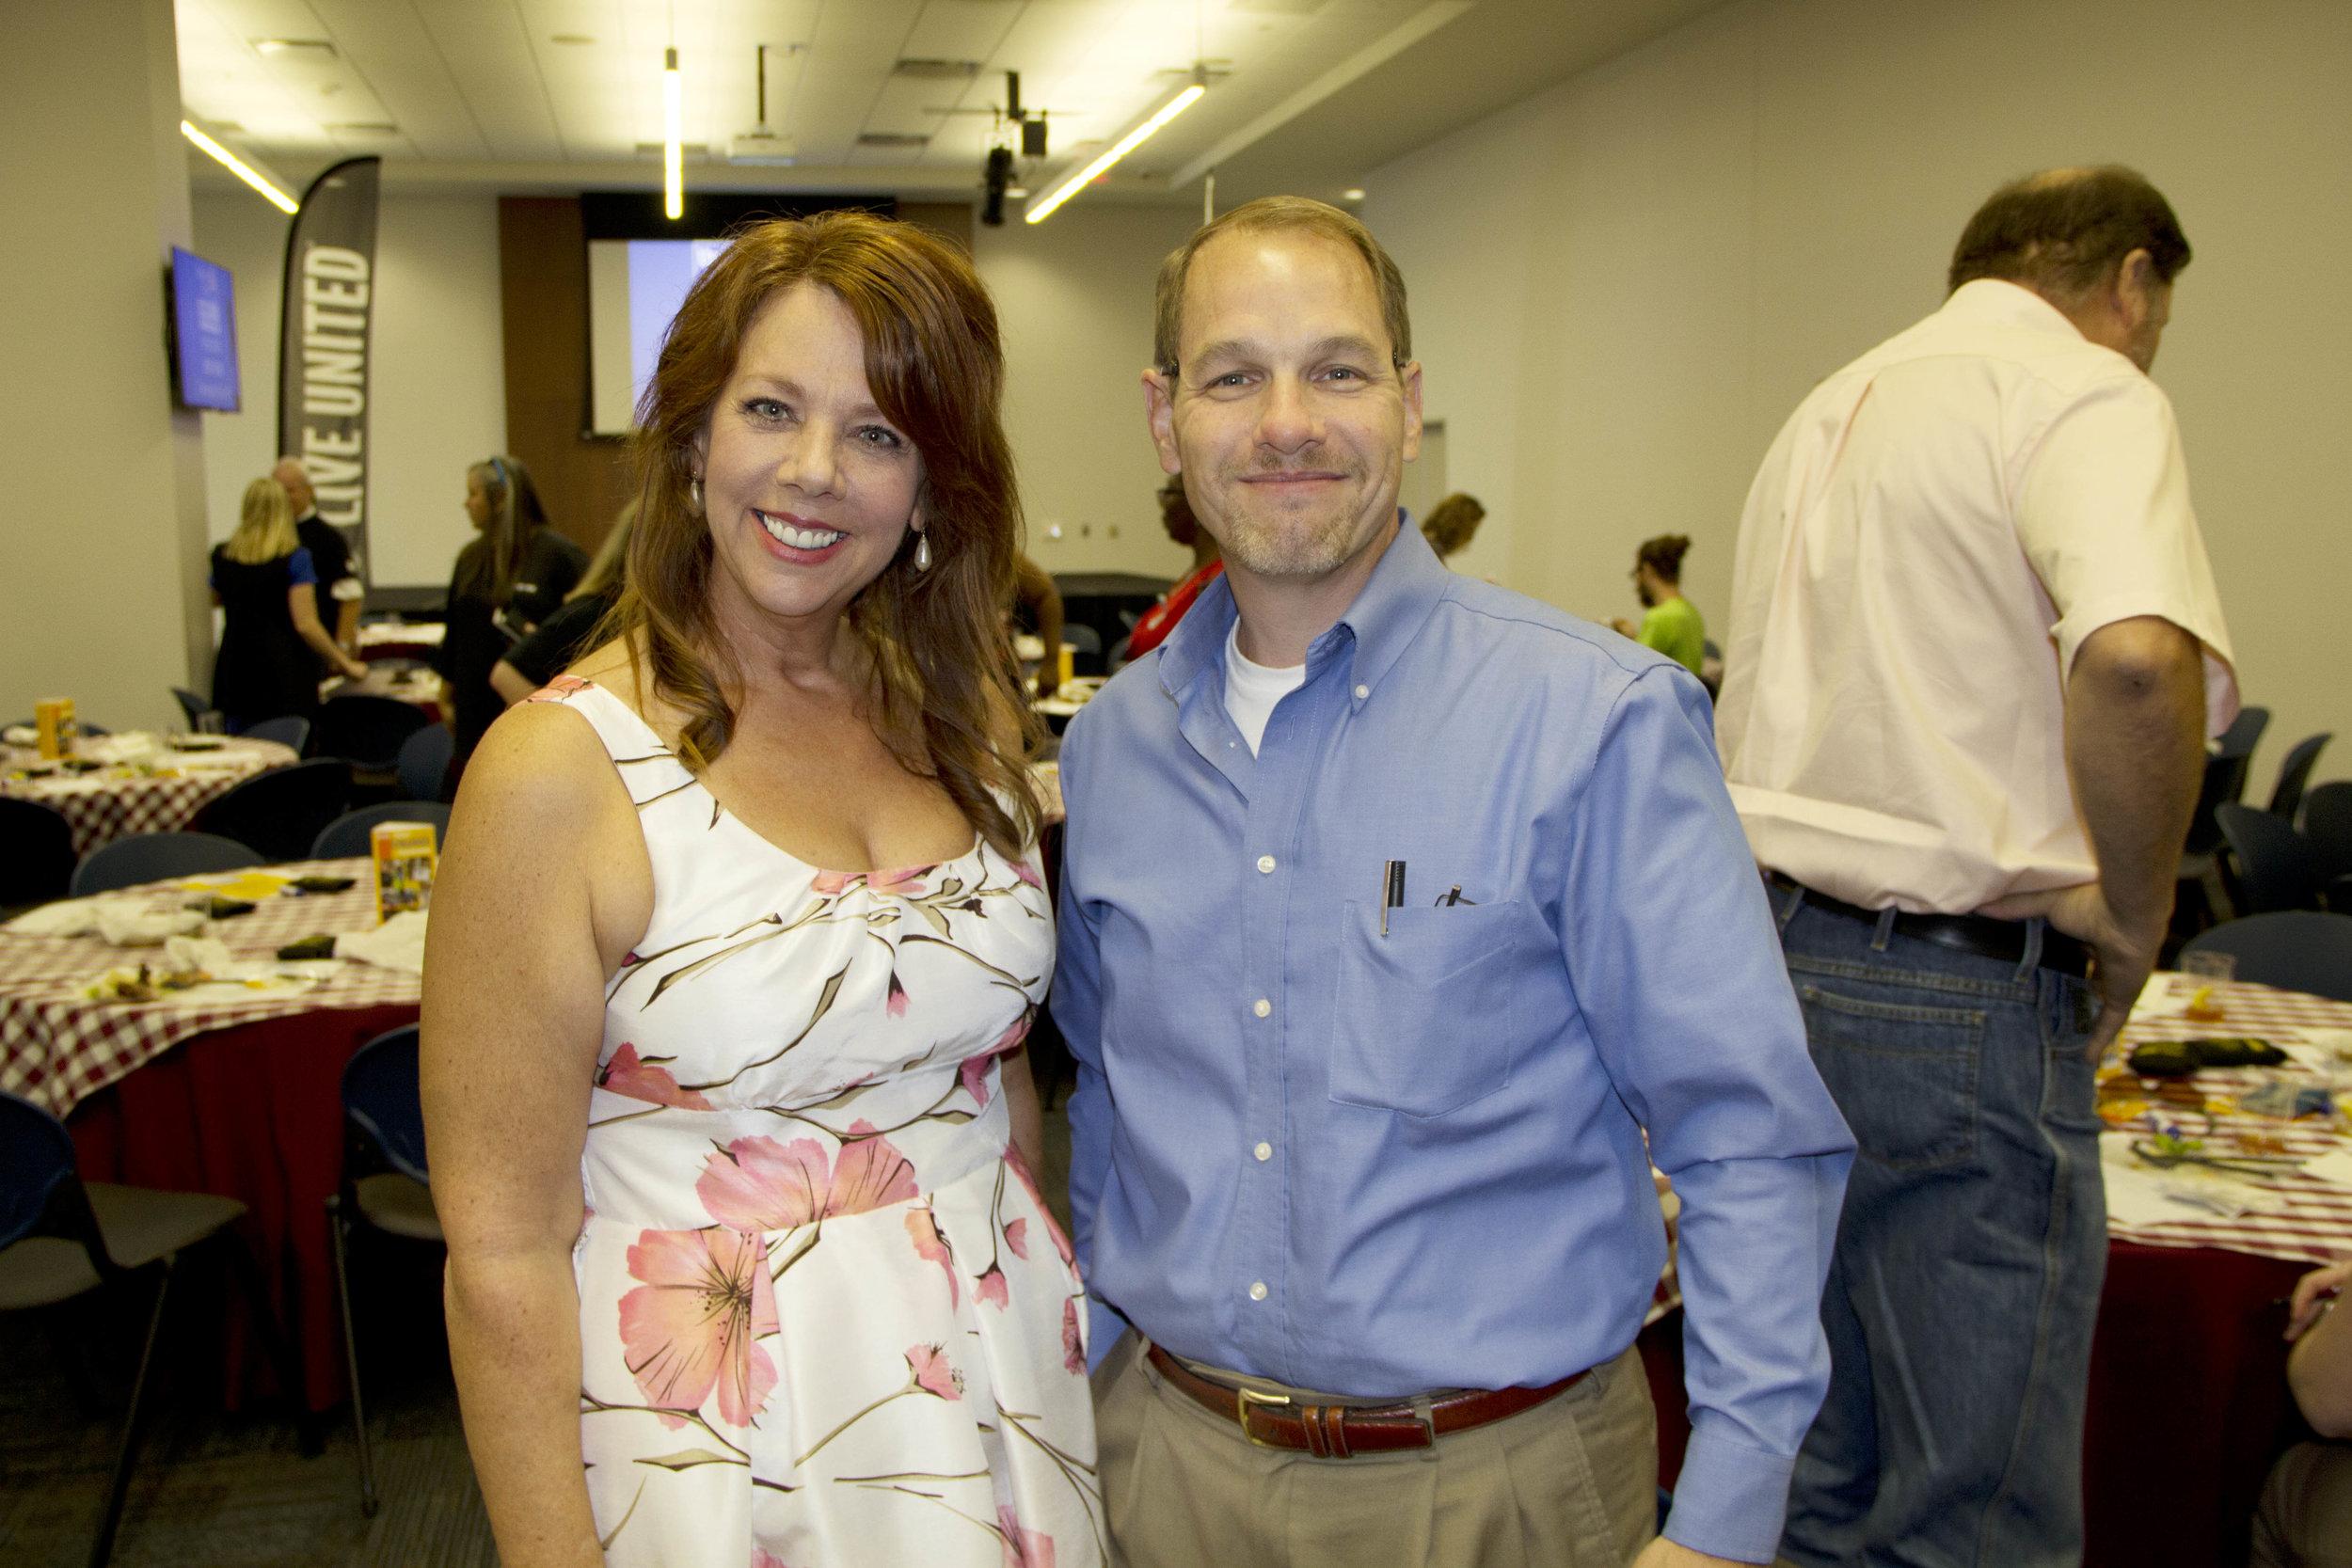 Michelle Walraven and Steve Morriss